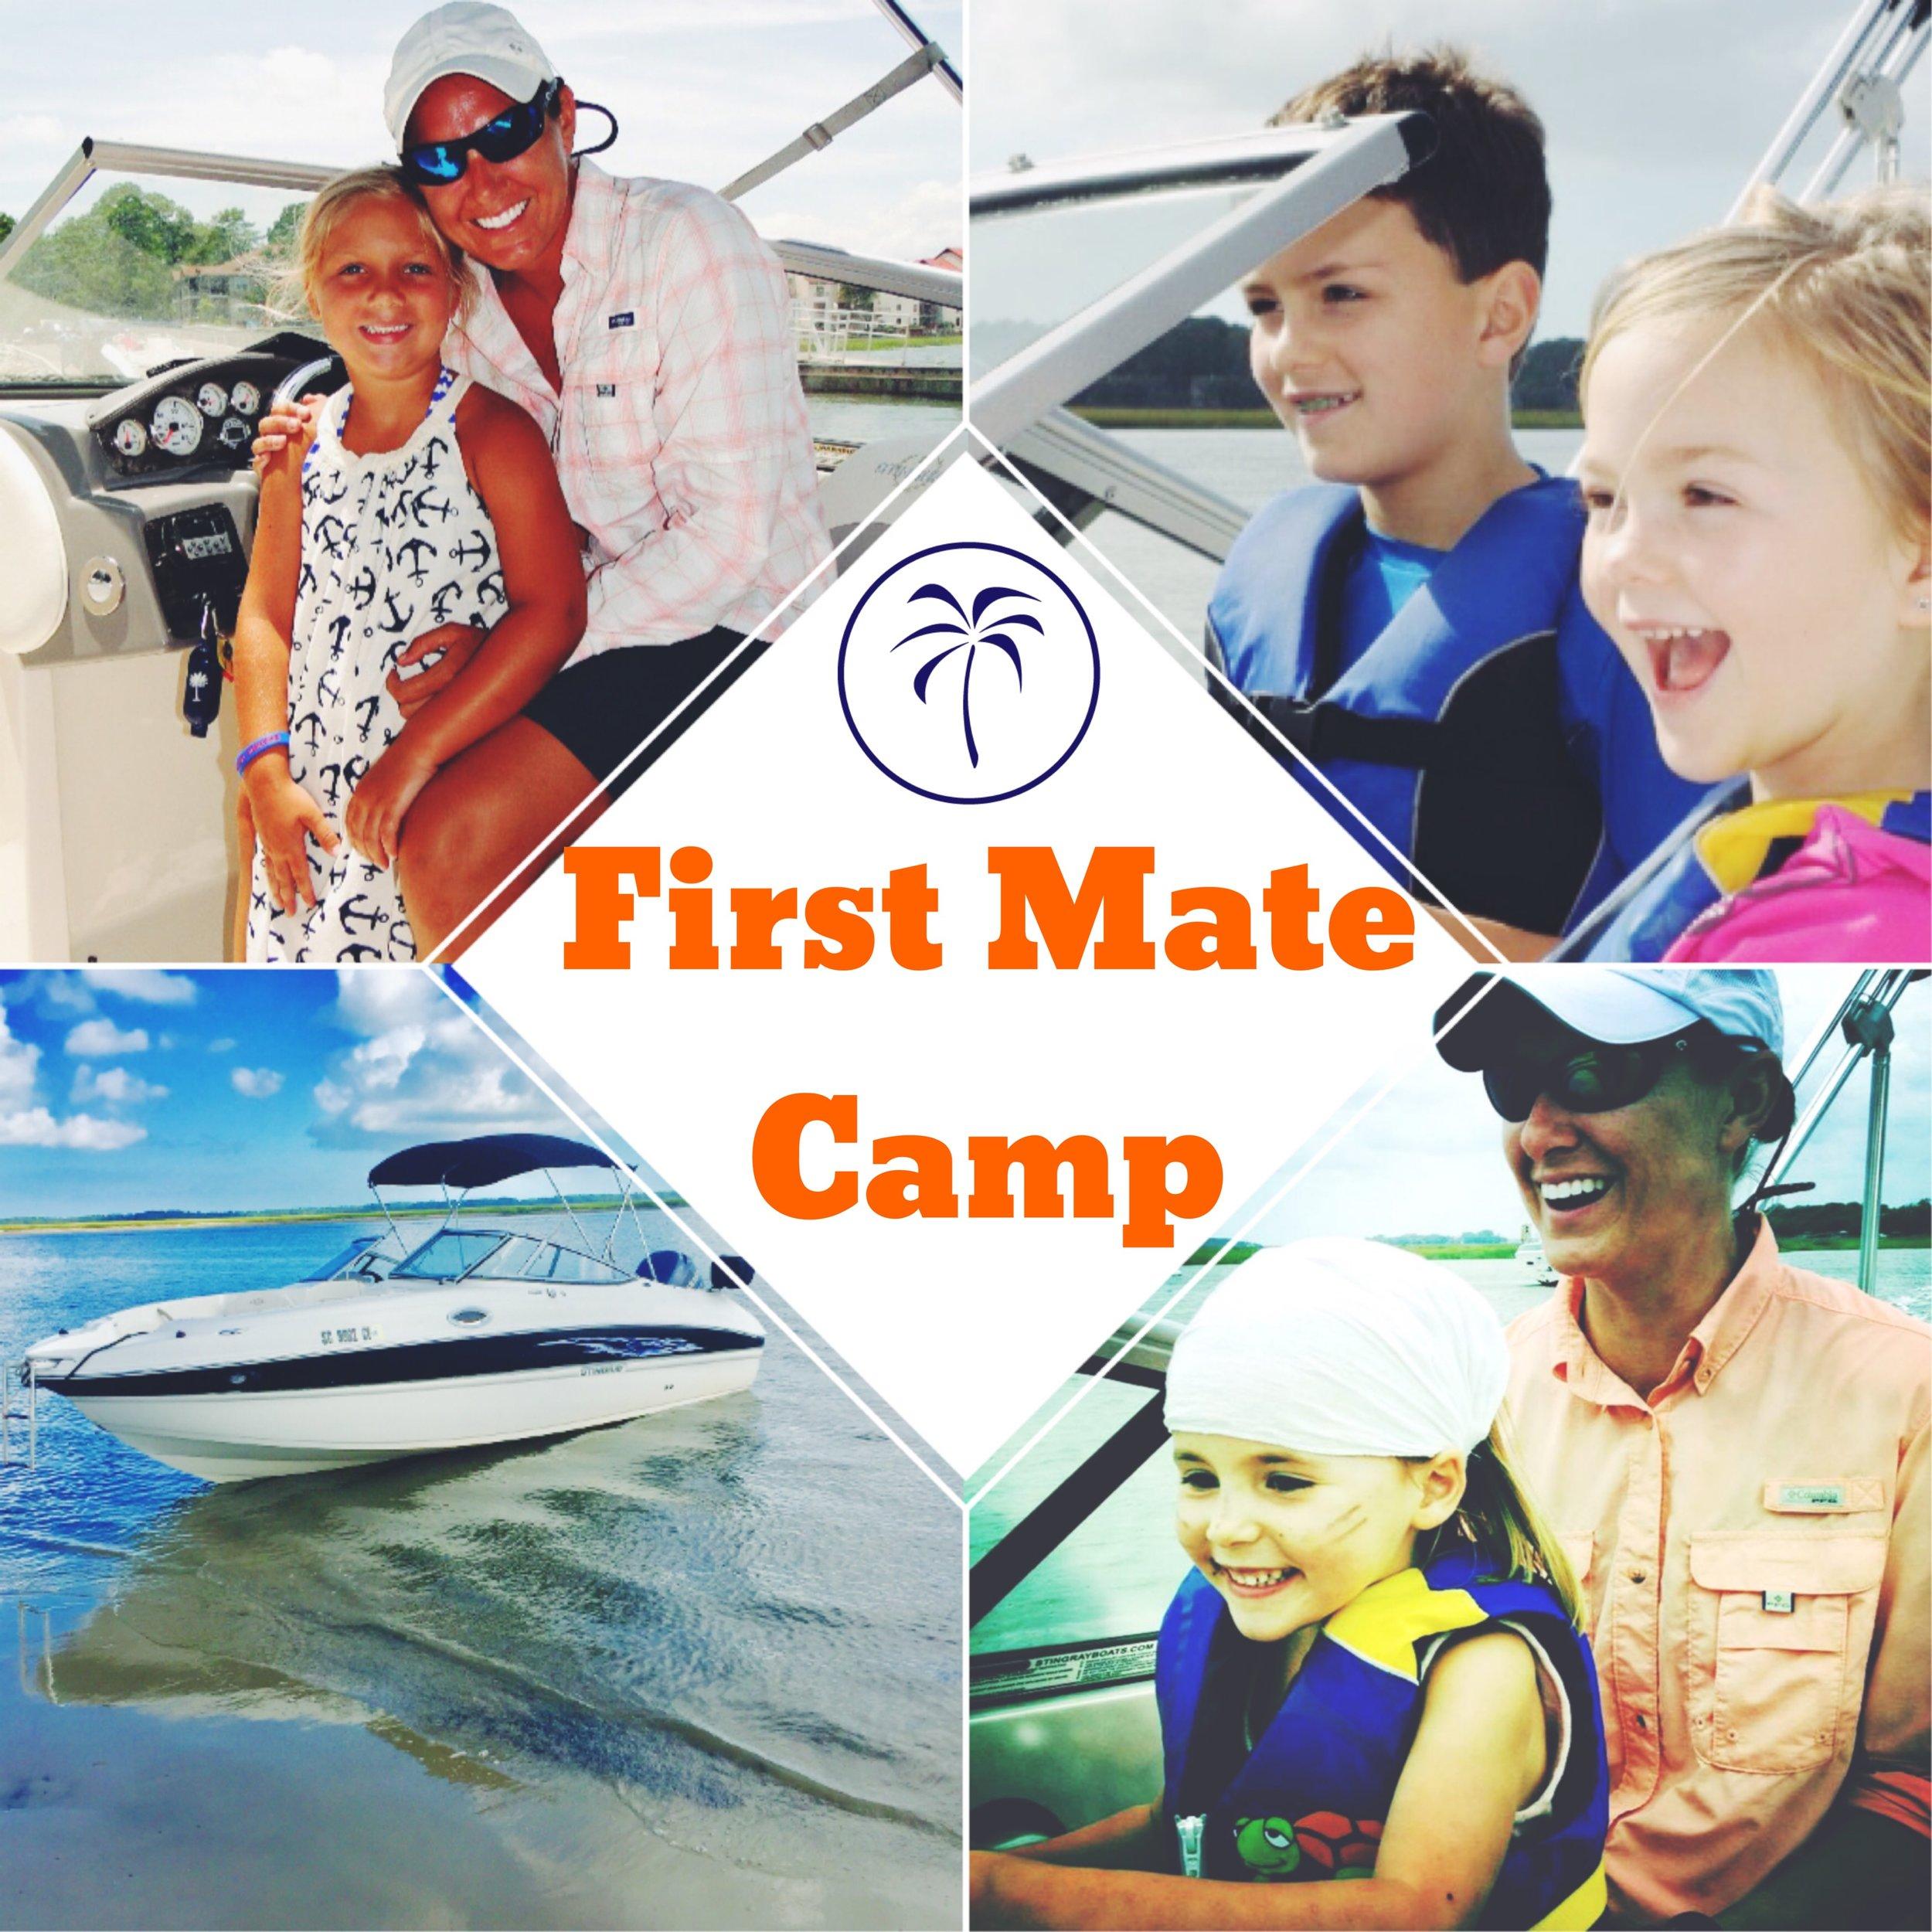 First Mate Camp pic.JPG